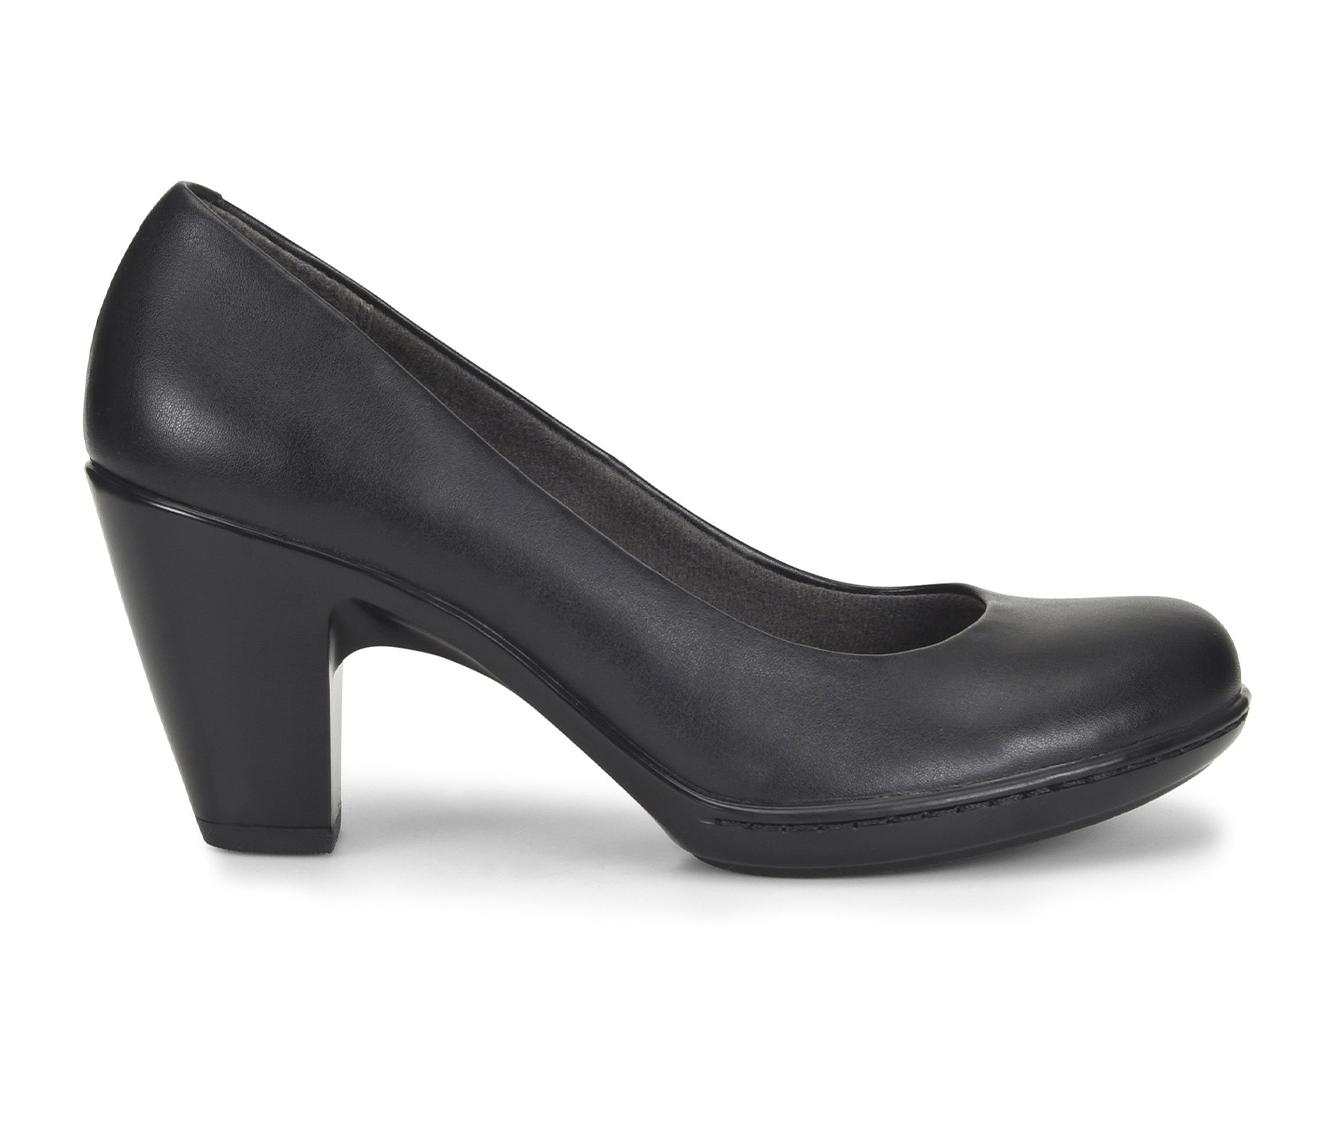 EuroSoft Vella Women's Dress Shoe (Black Faux Leather)